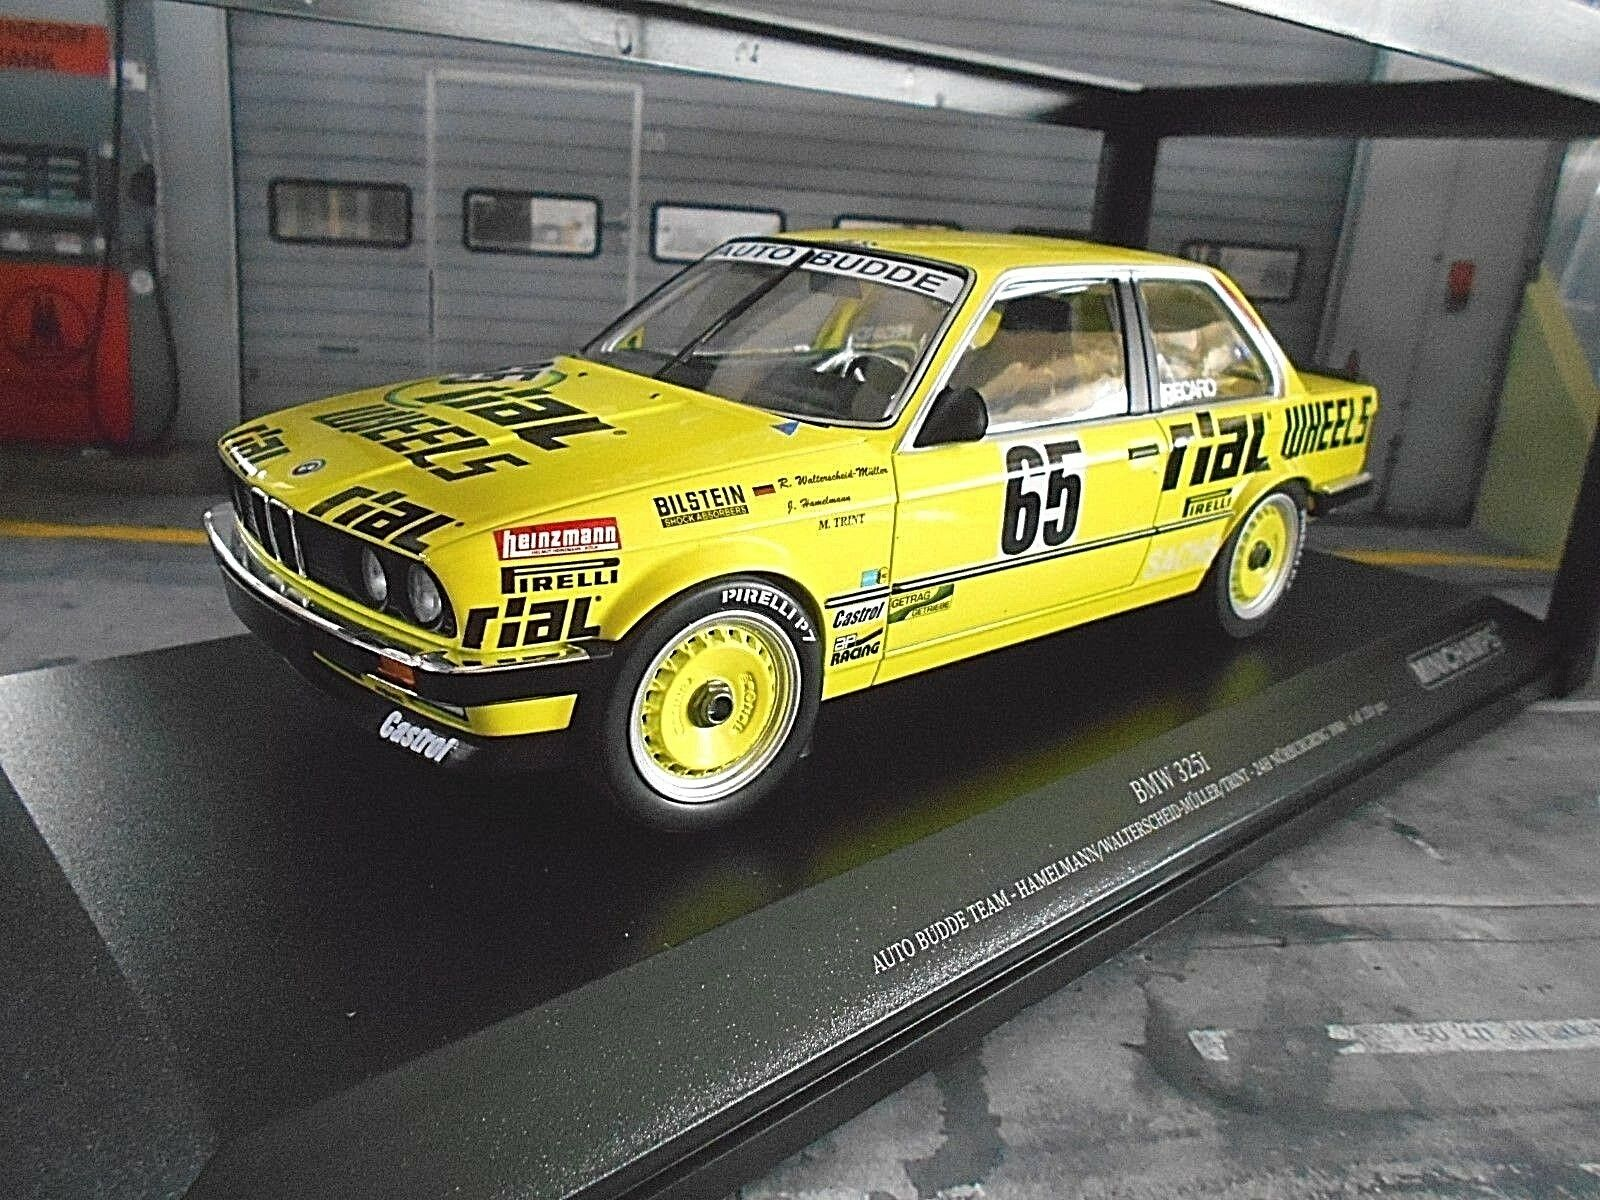 BMW 325i 3er e30 24 H Nurburgring Budde  65 hammelmann Trint 1986 Minichamps 1 18